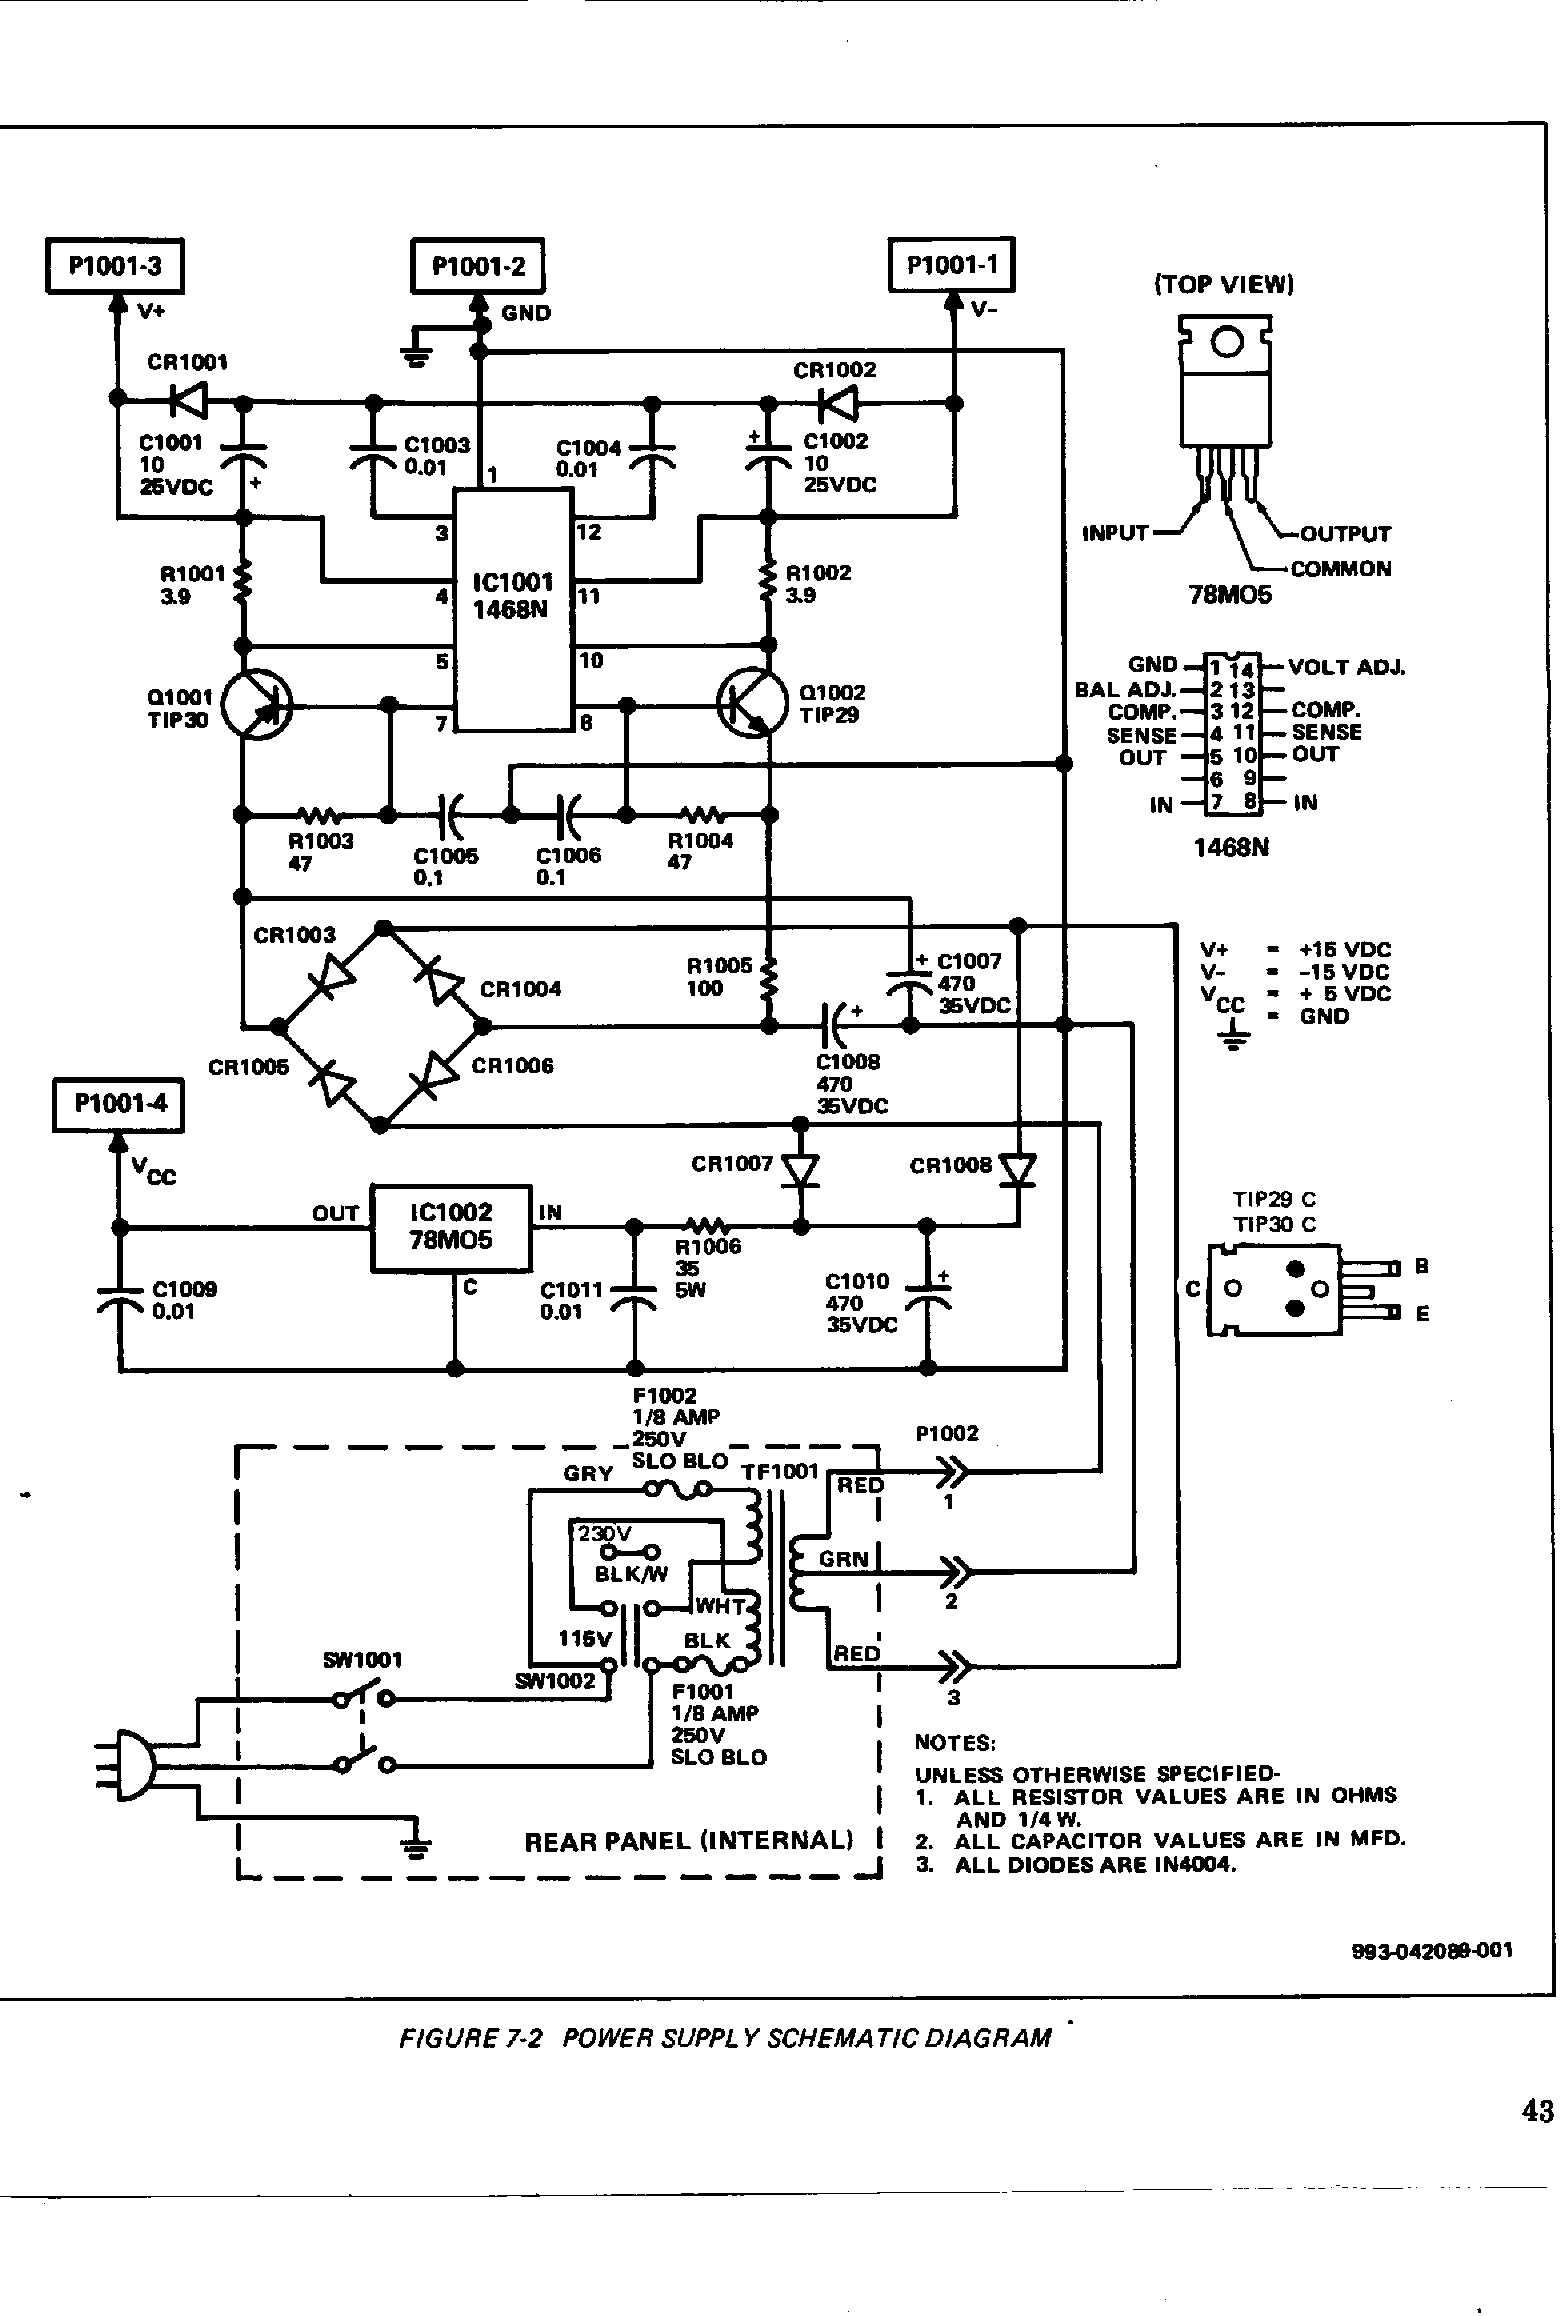 Synthfooldocsmoogtaurus 1 Voyager Circuit Diagram Taurus Power Supply